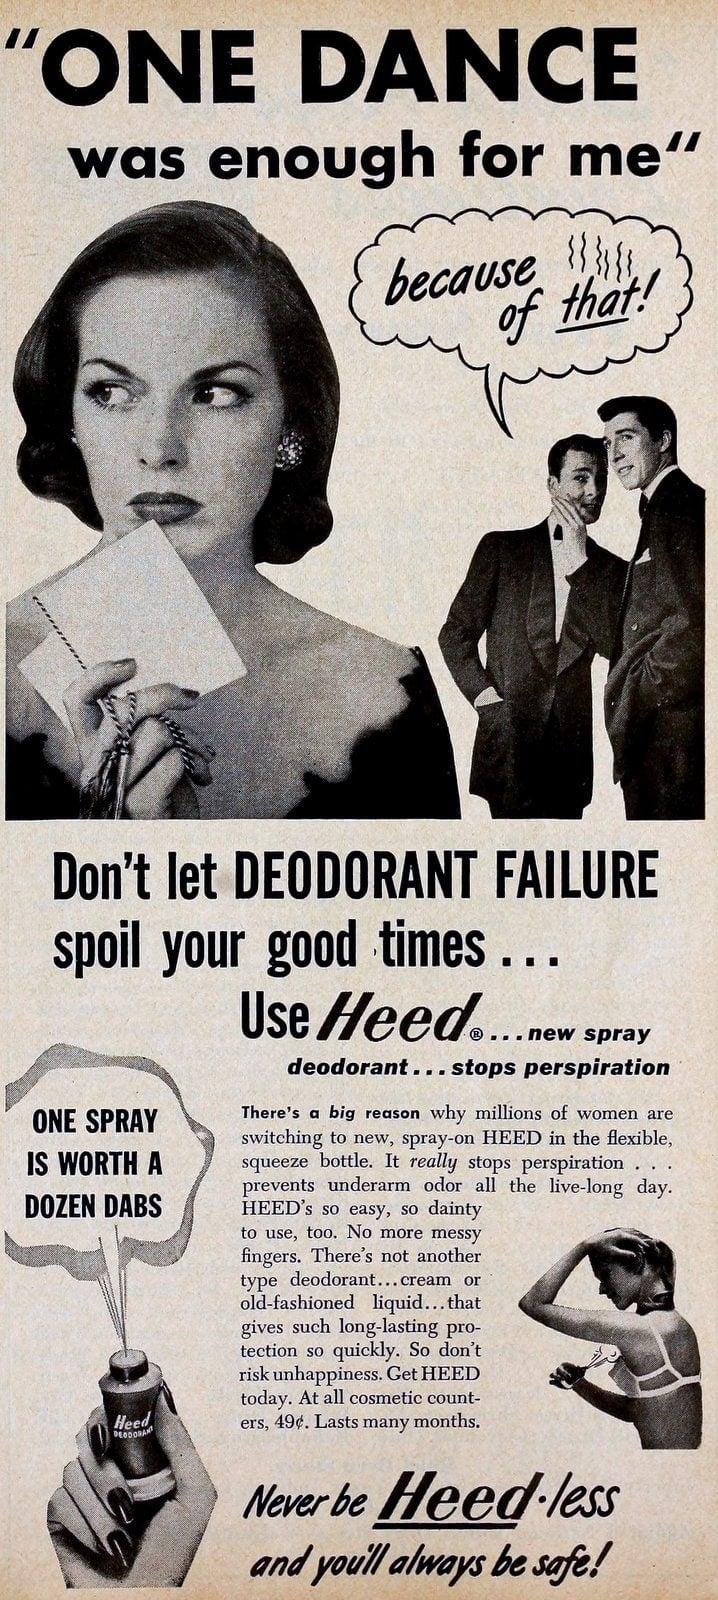 Heed deodorant from 1950